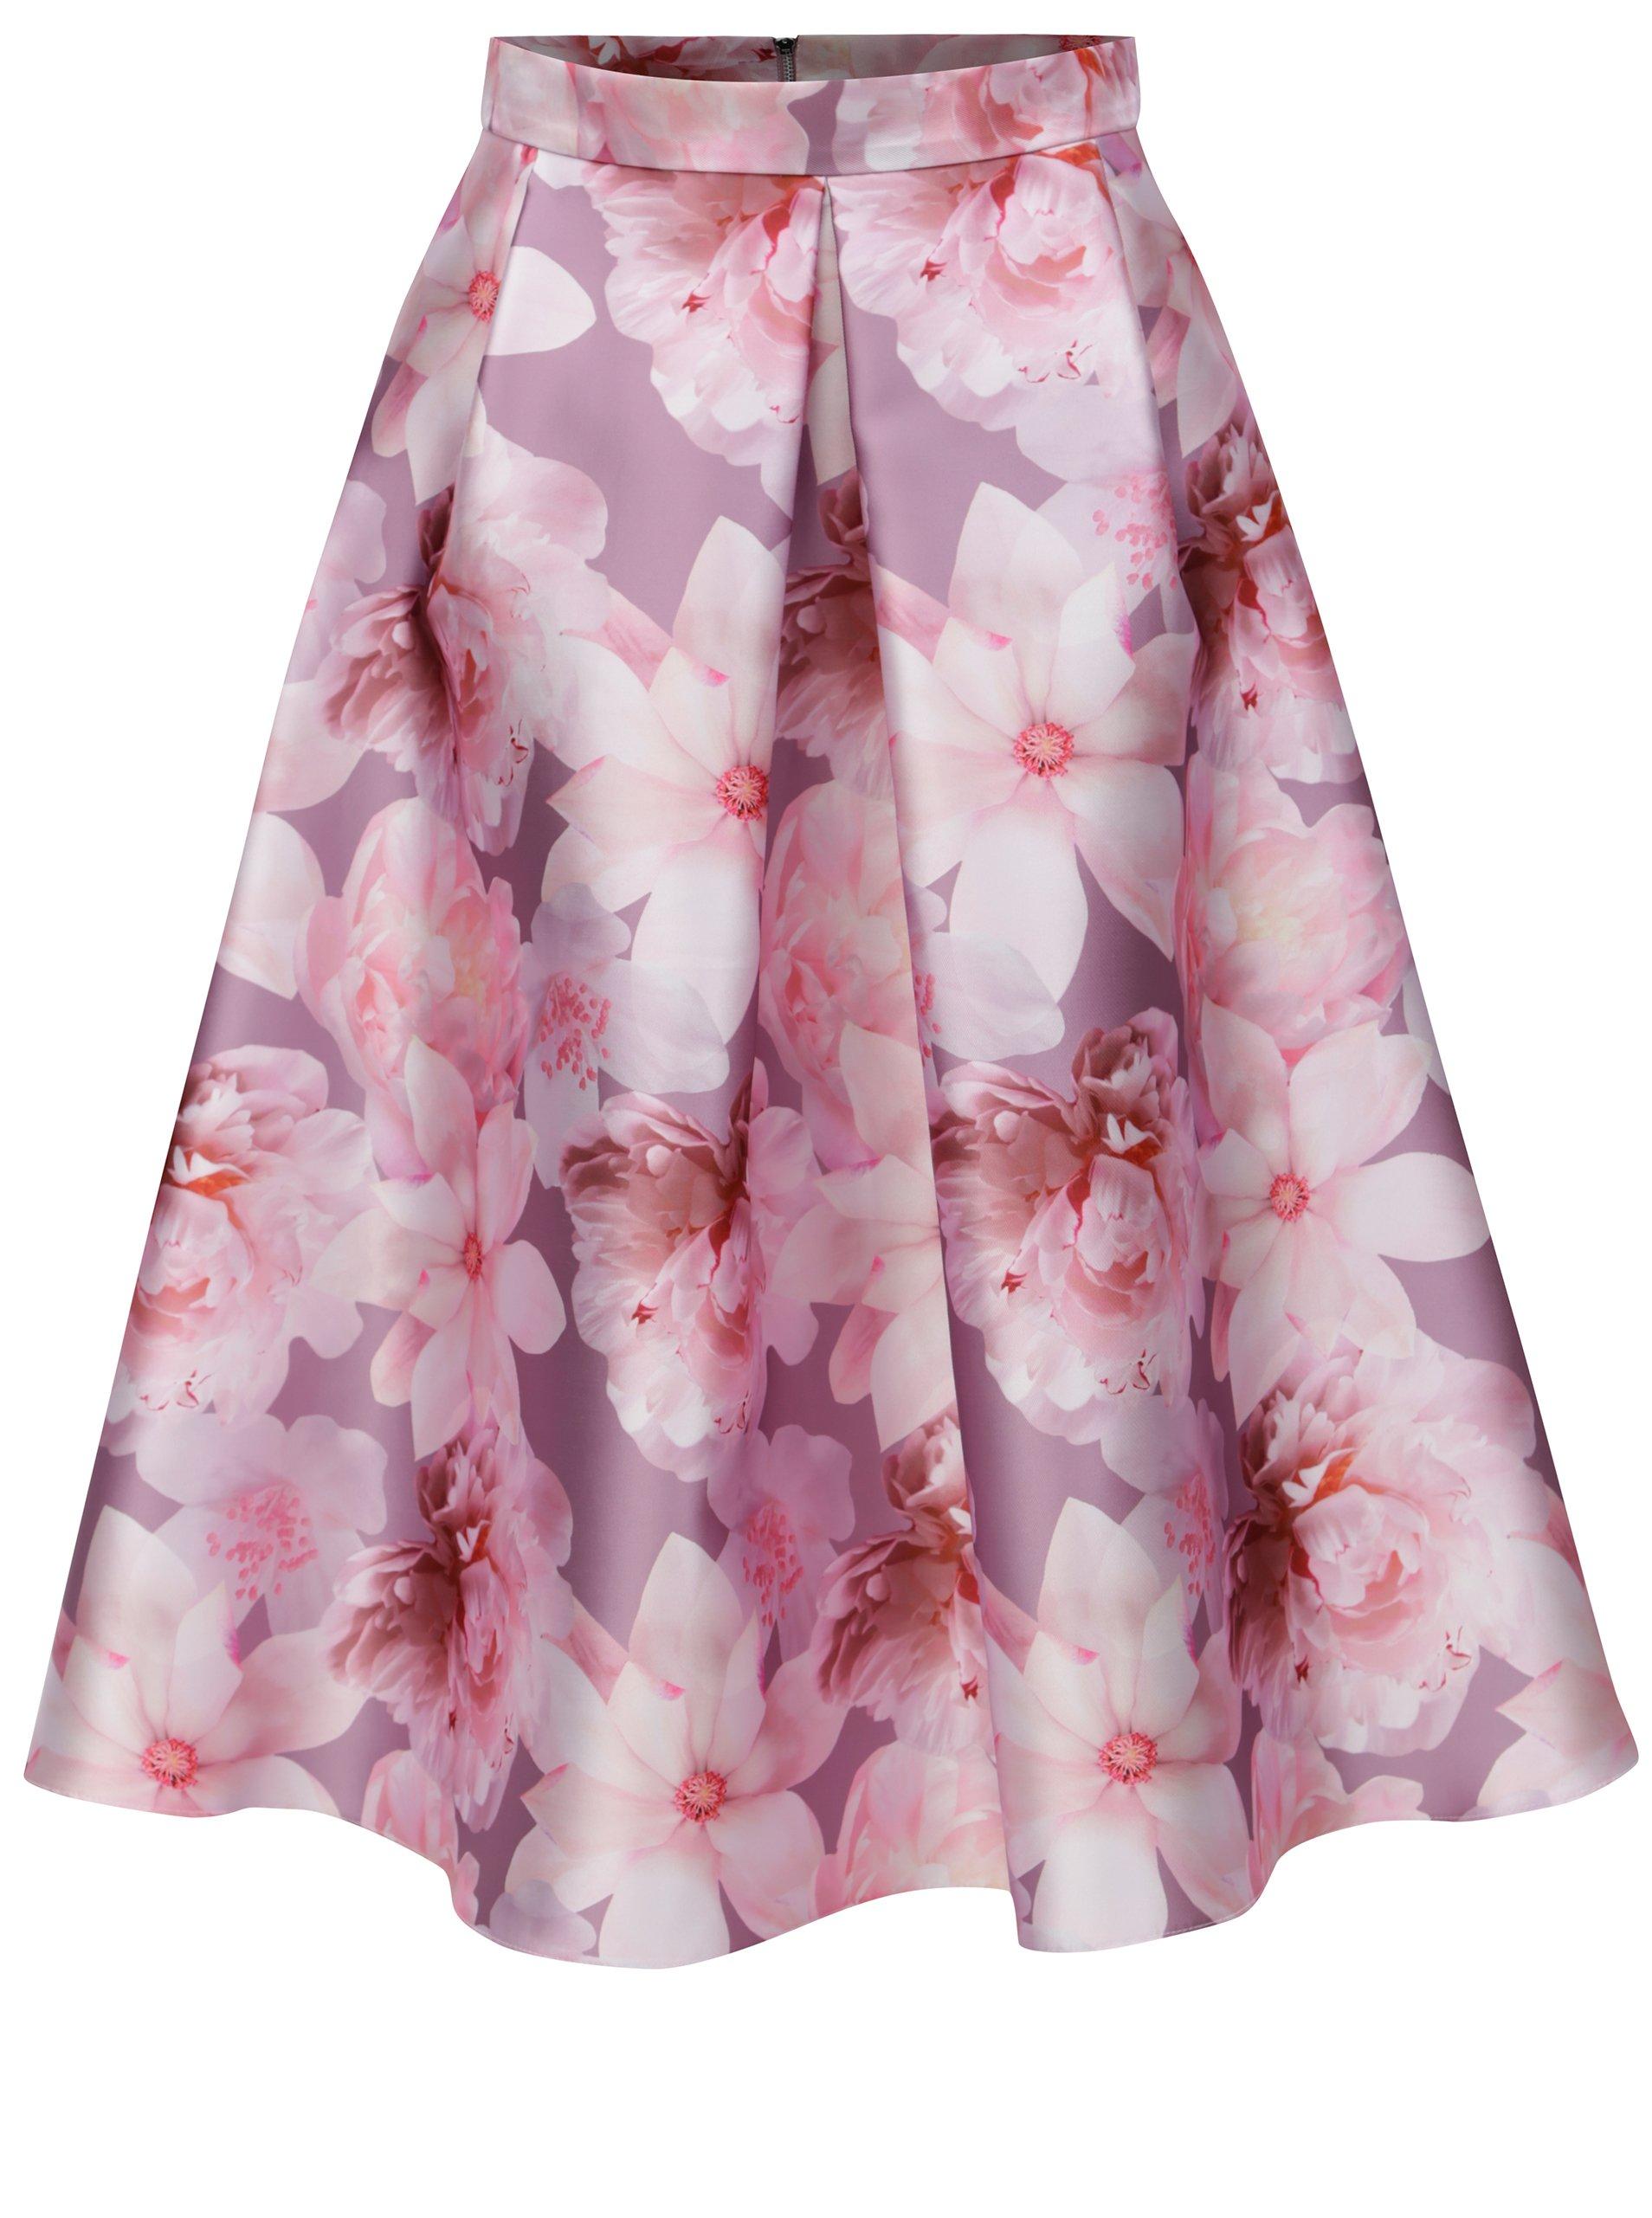 Růžová květovaná skládaná midi sukn? Dorothy Perkins